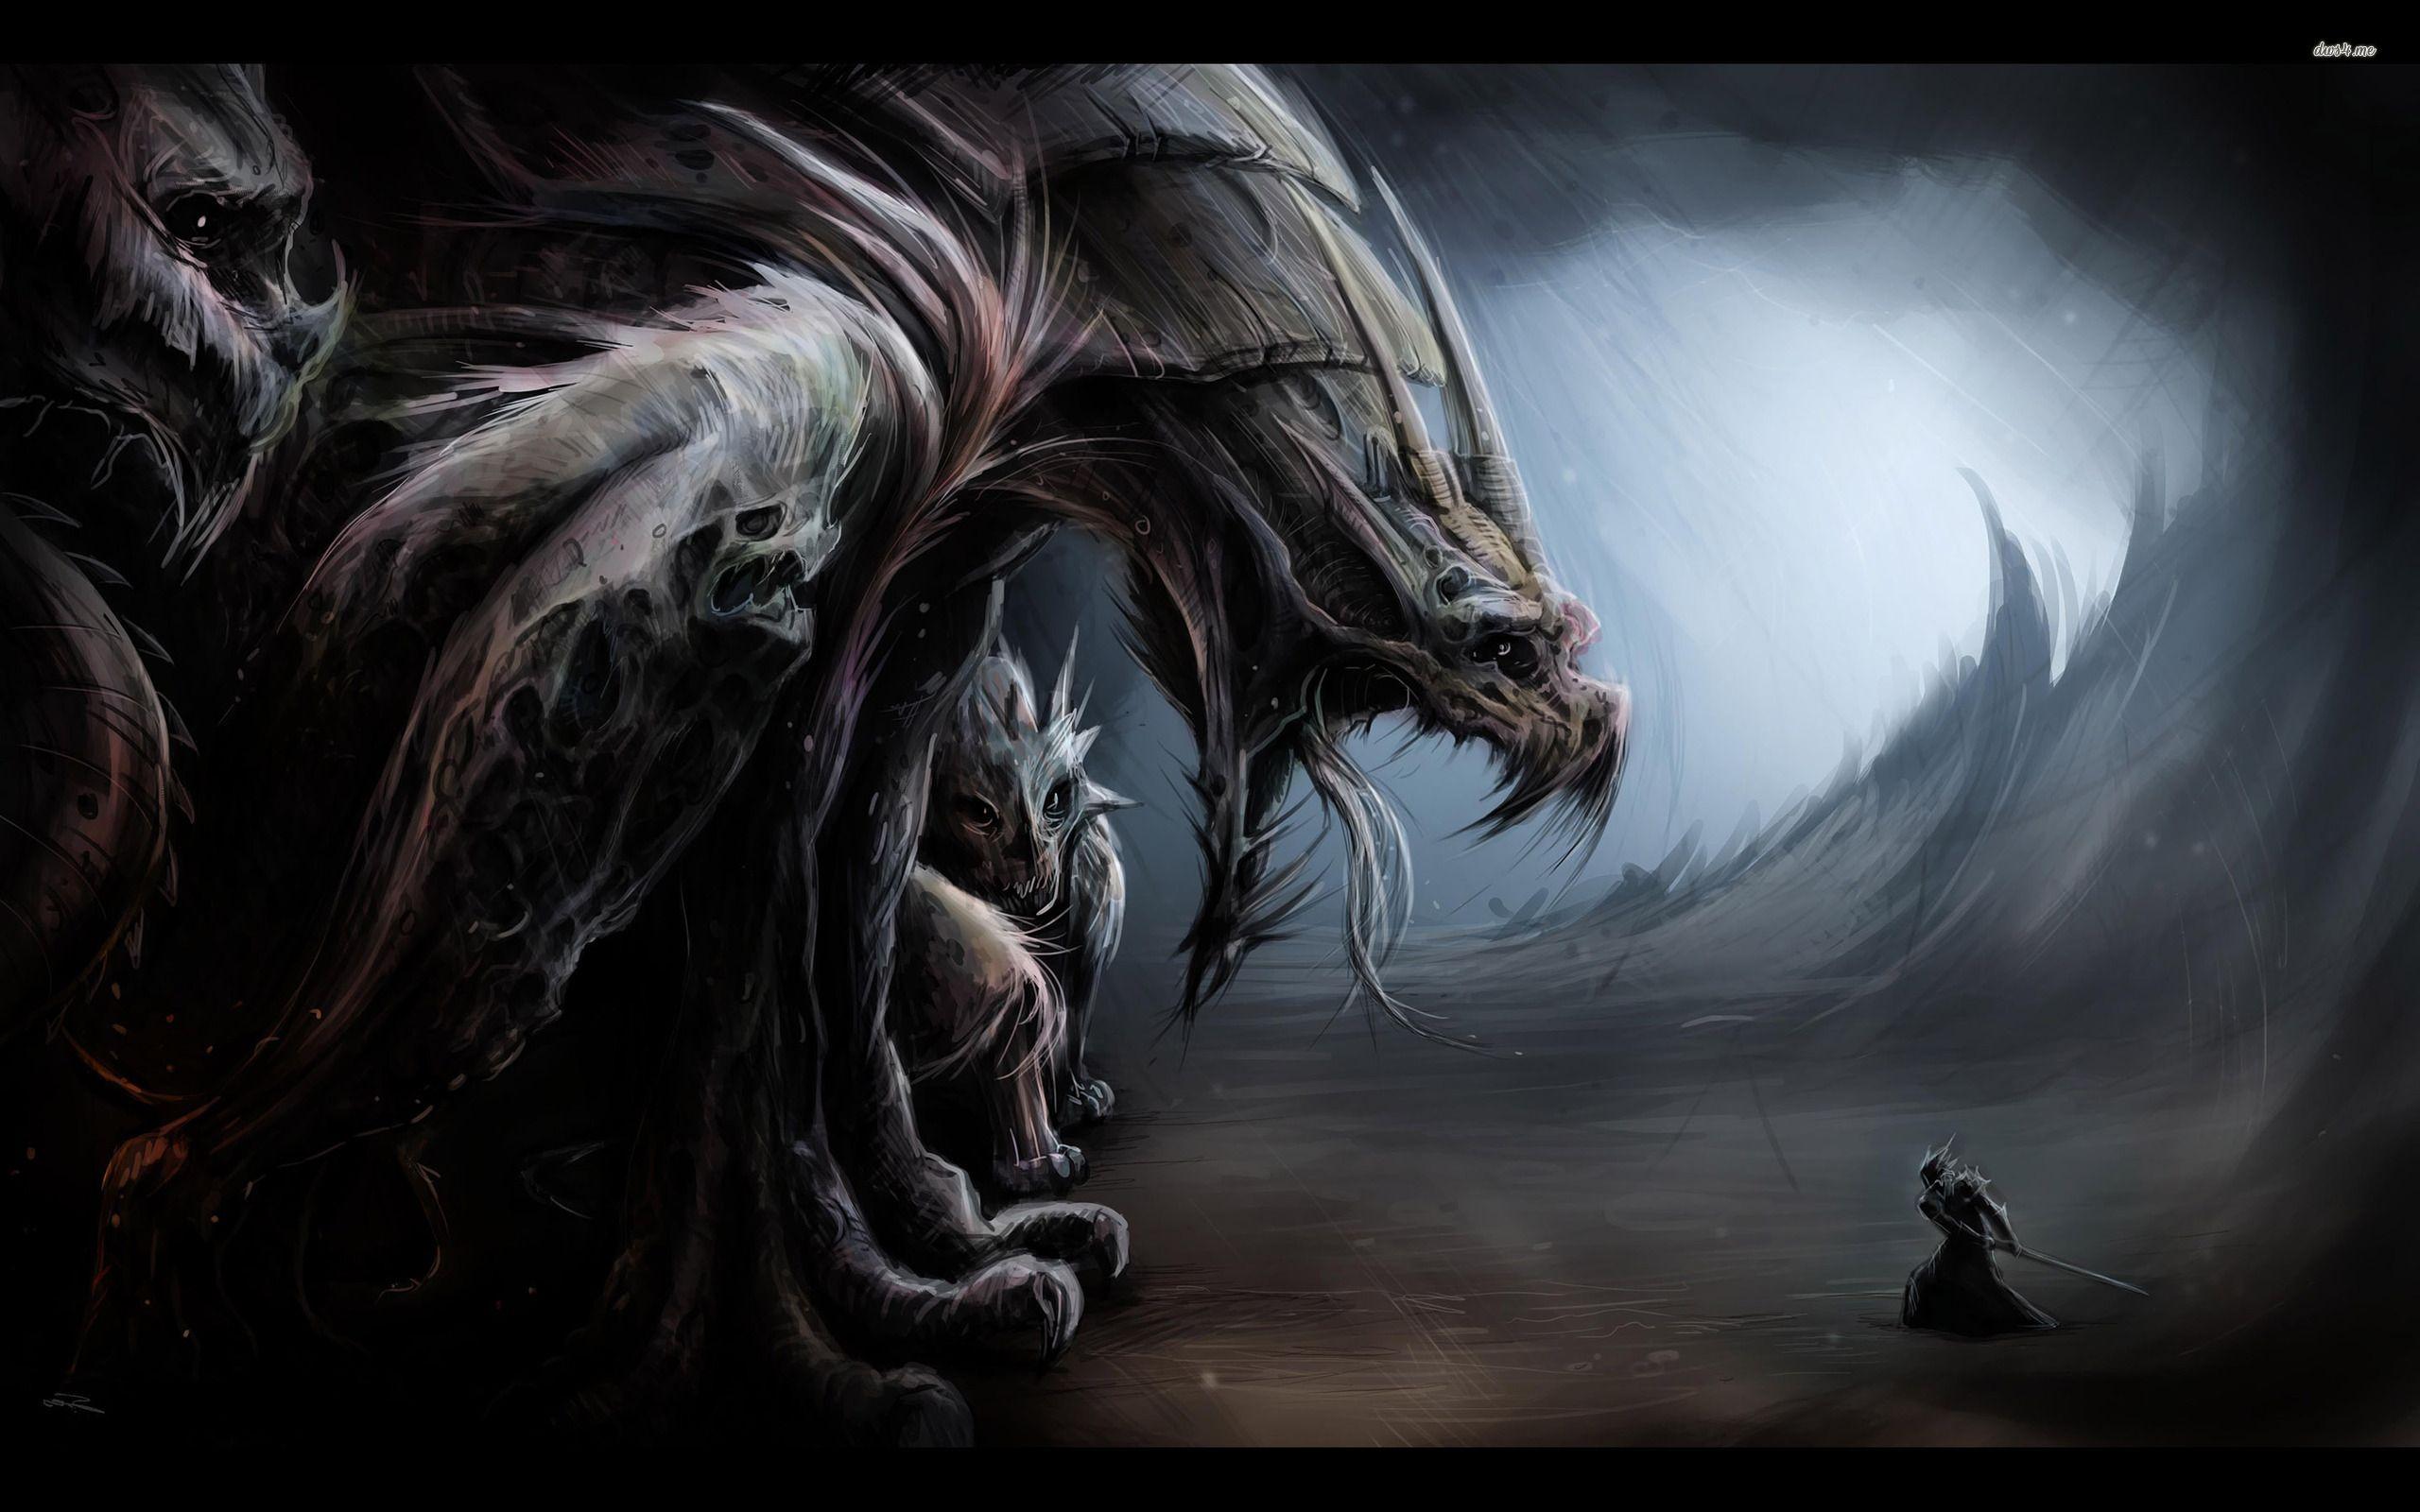 Warrior Battling The Giant Monsters Wallpaper Fantasy Wallpapers